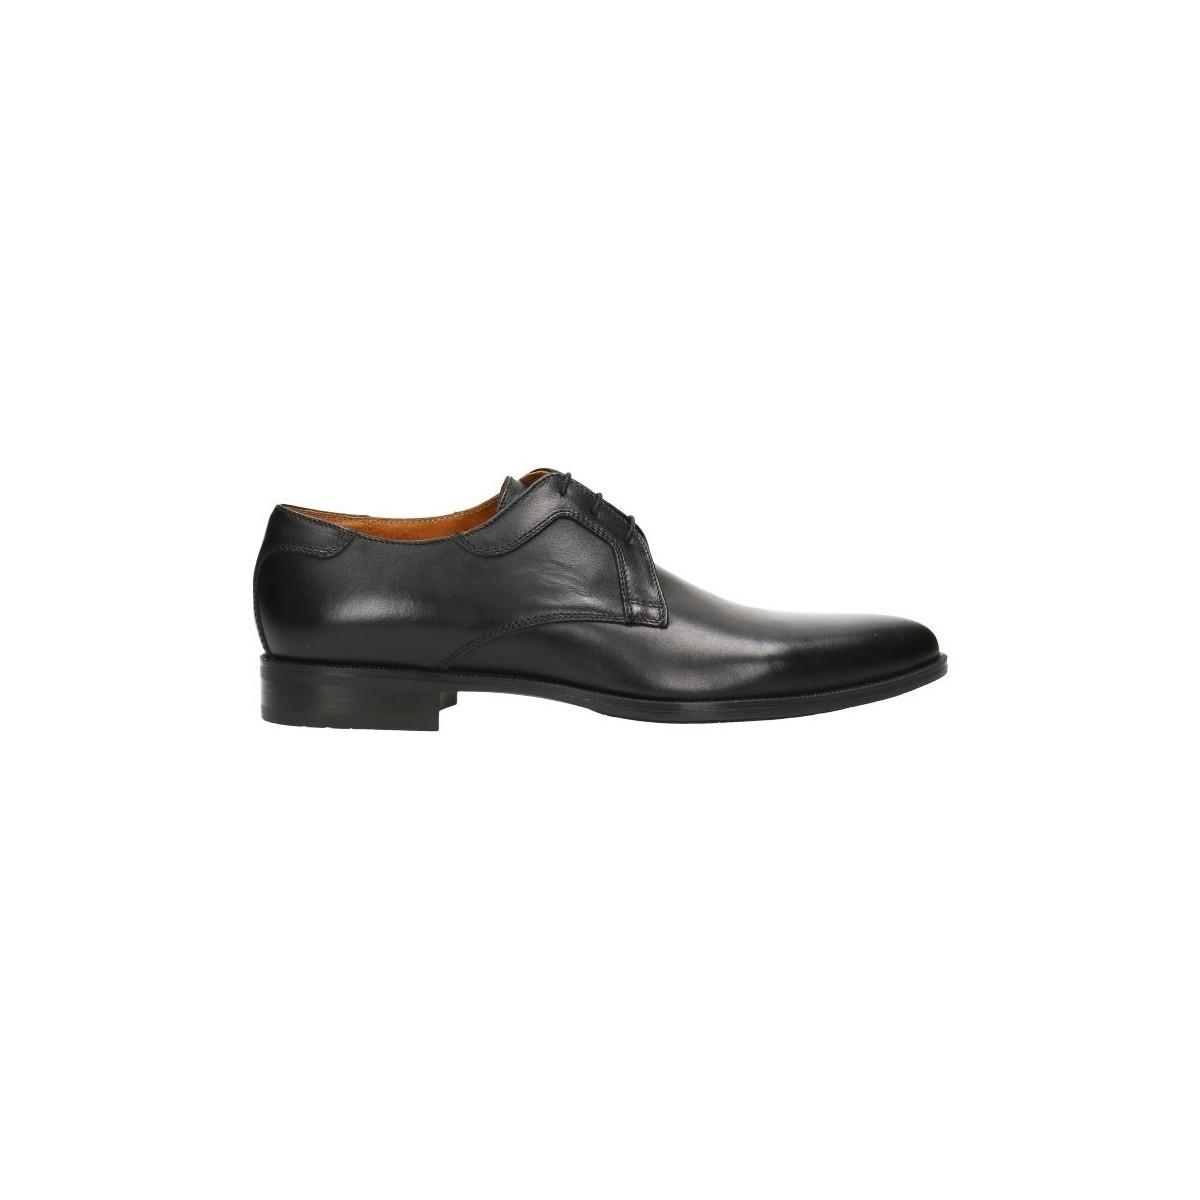 Gino Rossi Derbies Mpc653 Black Man Spring/summer Collection 2018 Men's Smart / Formal Shoes In Black for Men